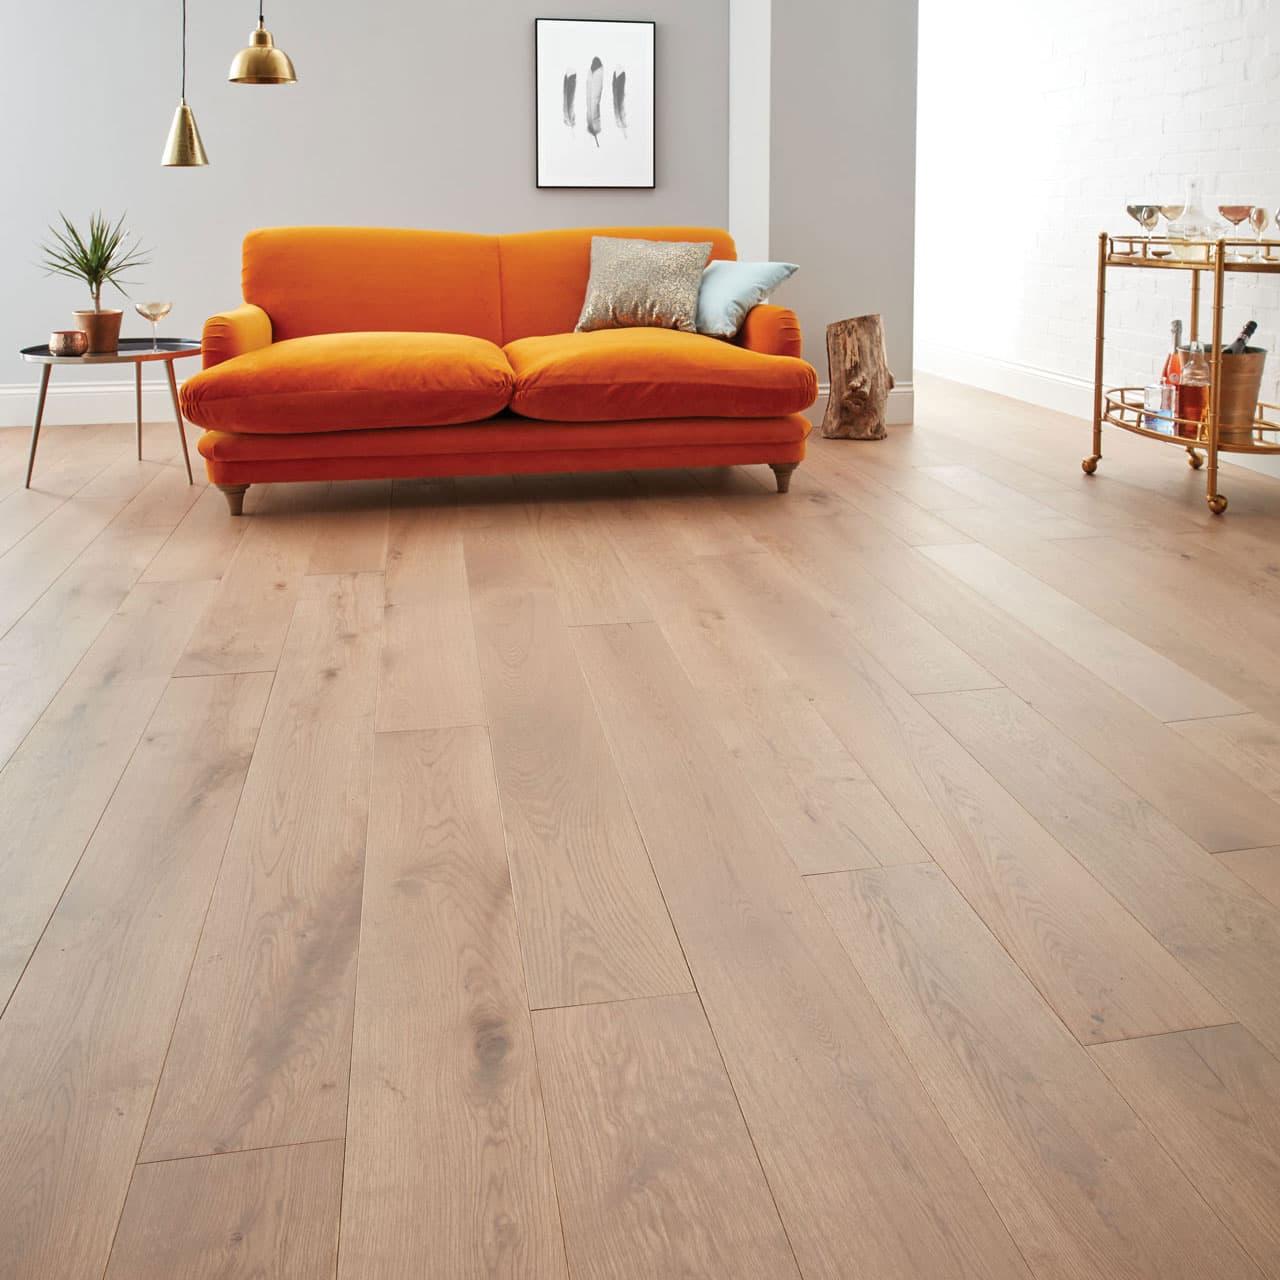 product-engineered-wood-chepstow-planed-grey-room